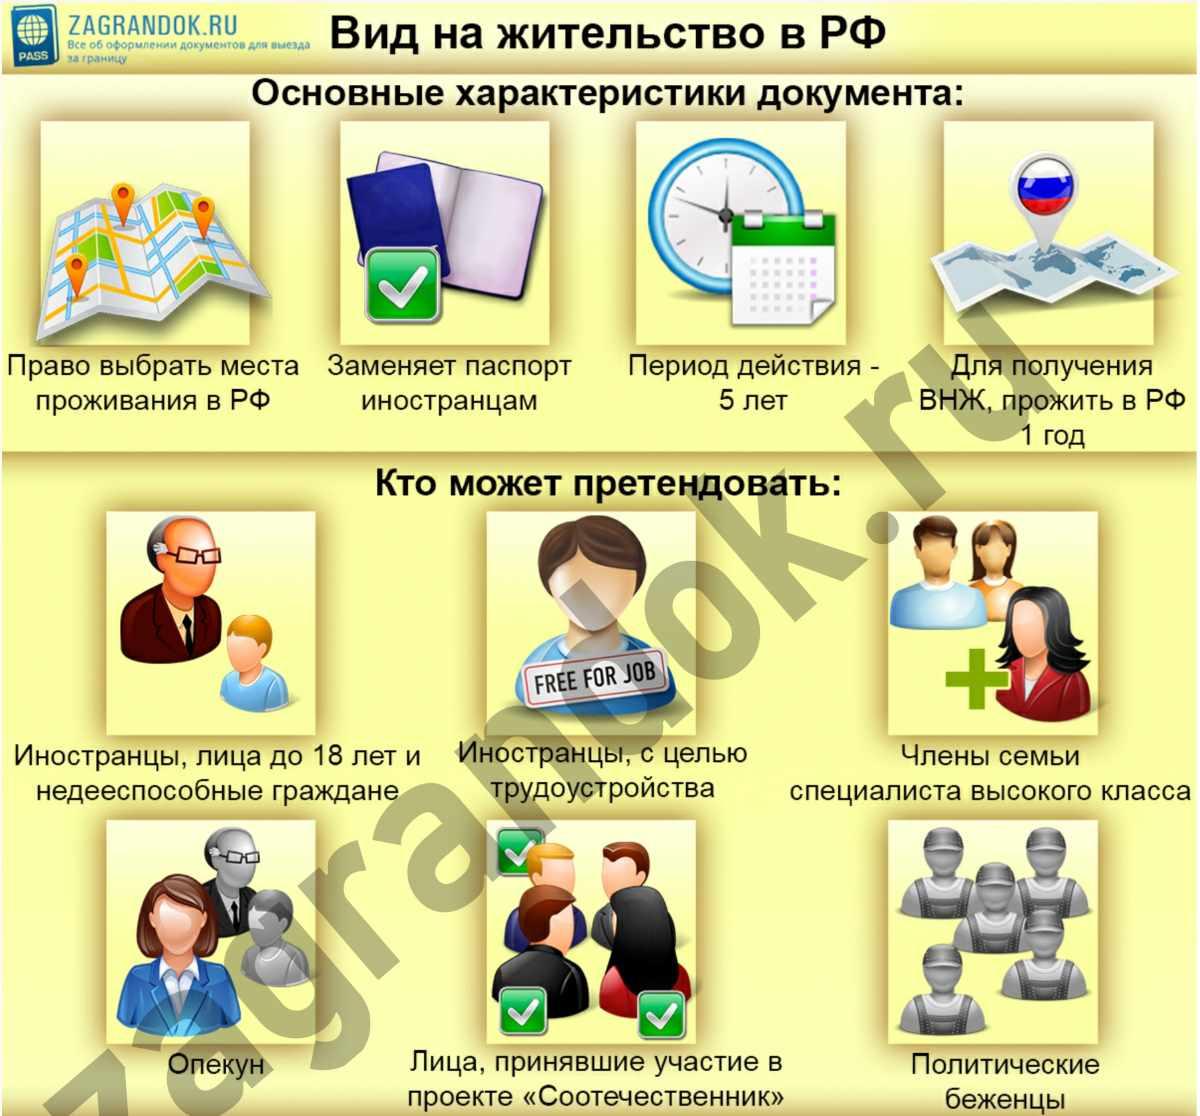 Вид на жительство в РФ_1